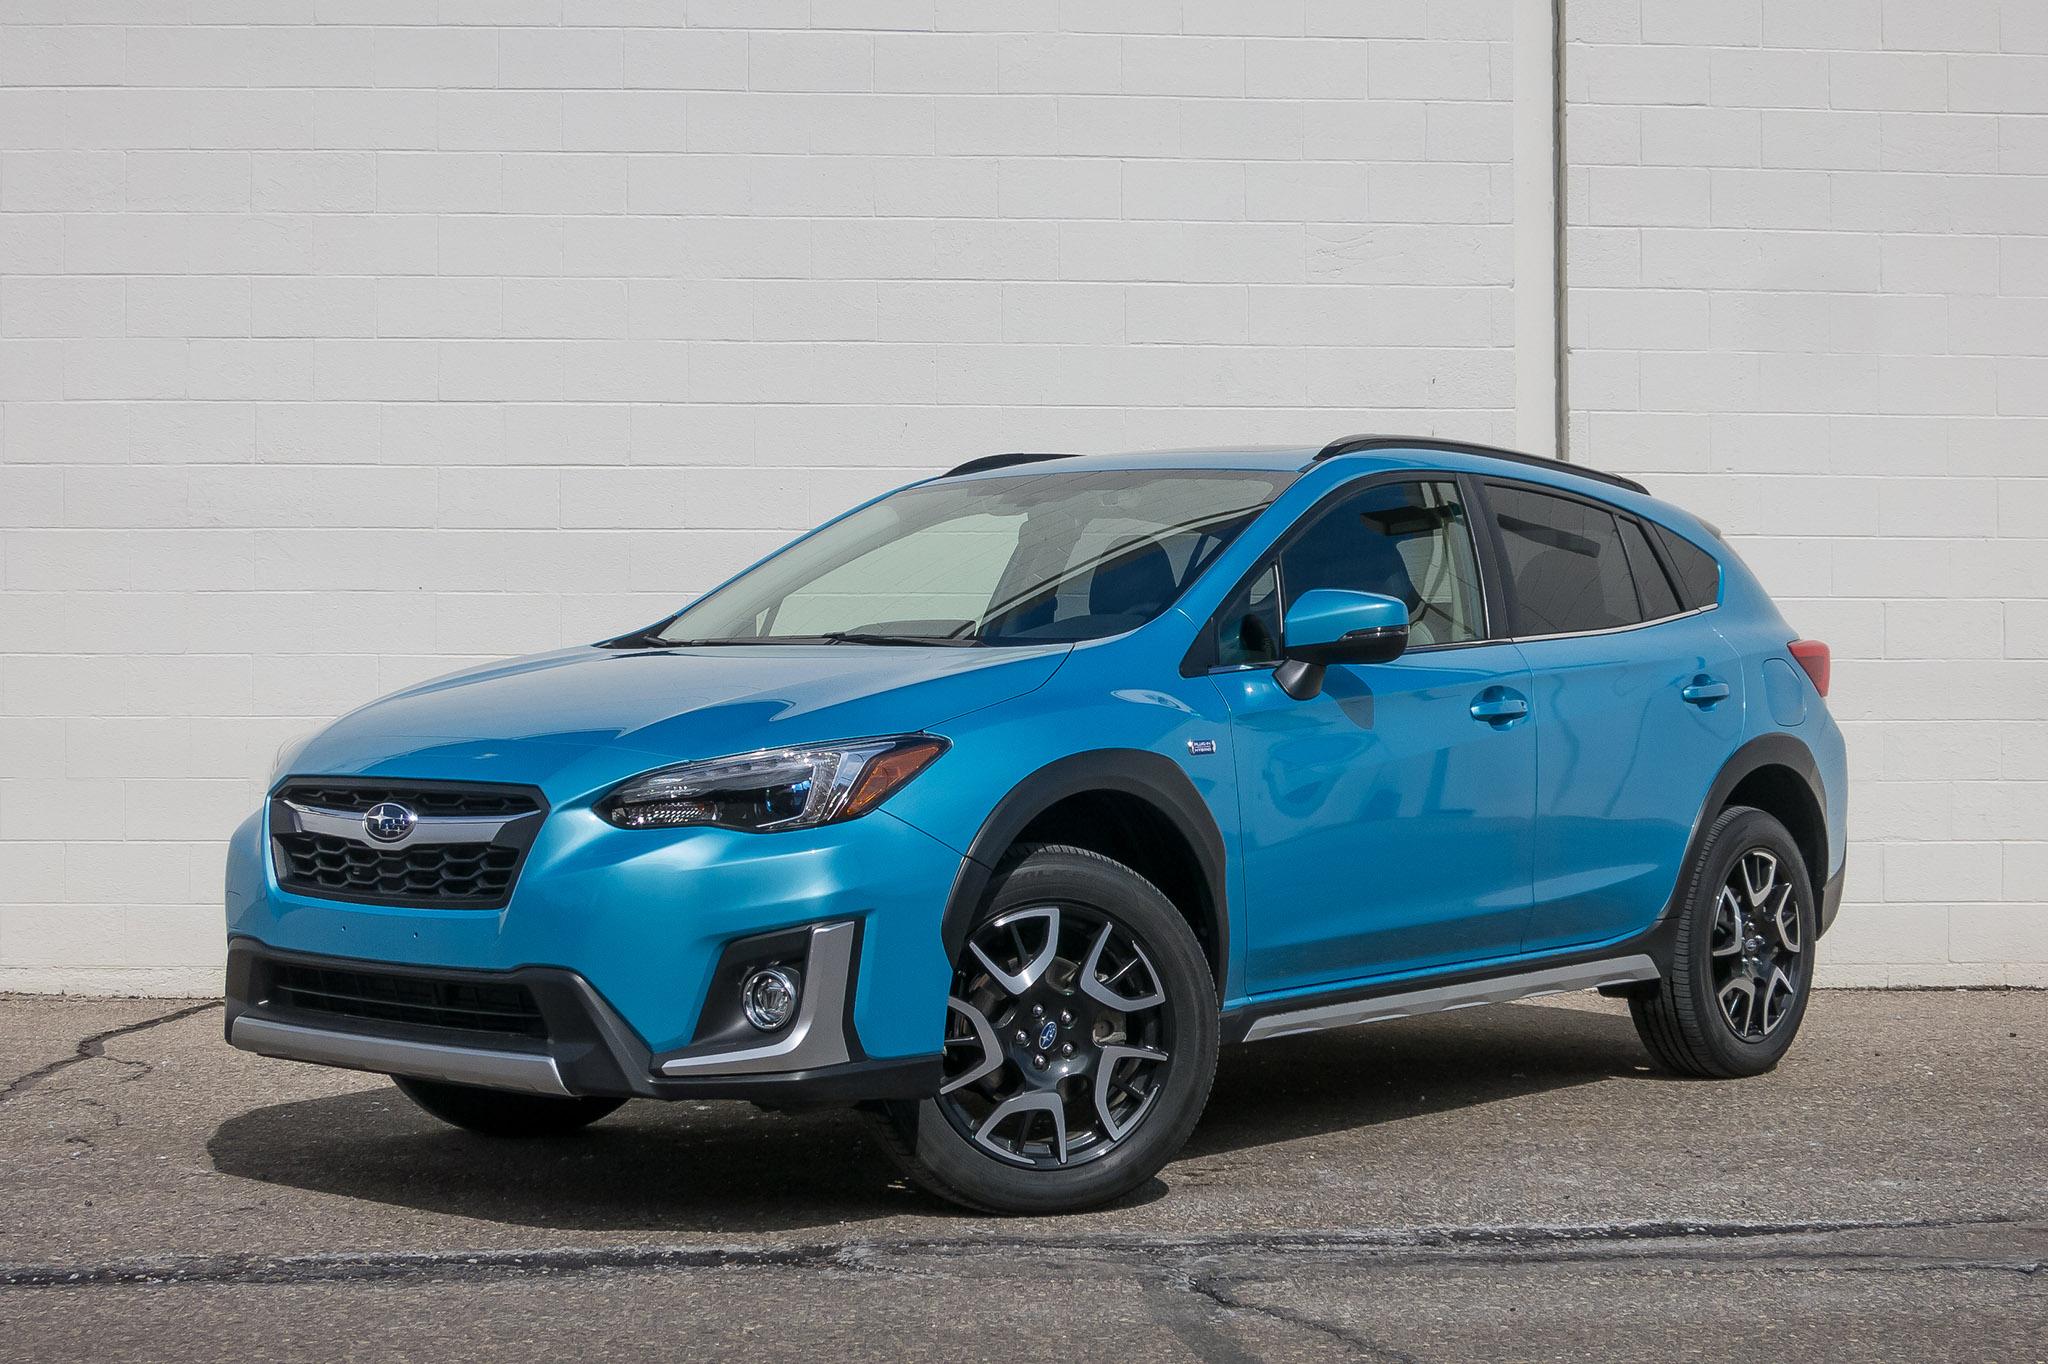 2017 Subaru Crosstrek Mpg >> 2019 Subaru Crosstrek Hybrid Review More Efficient Less